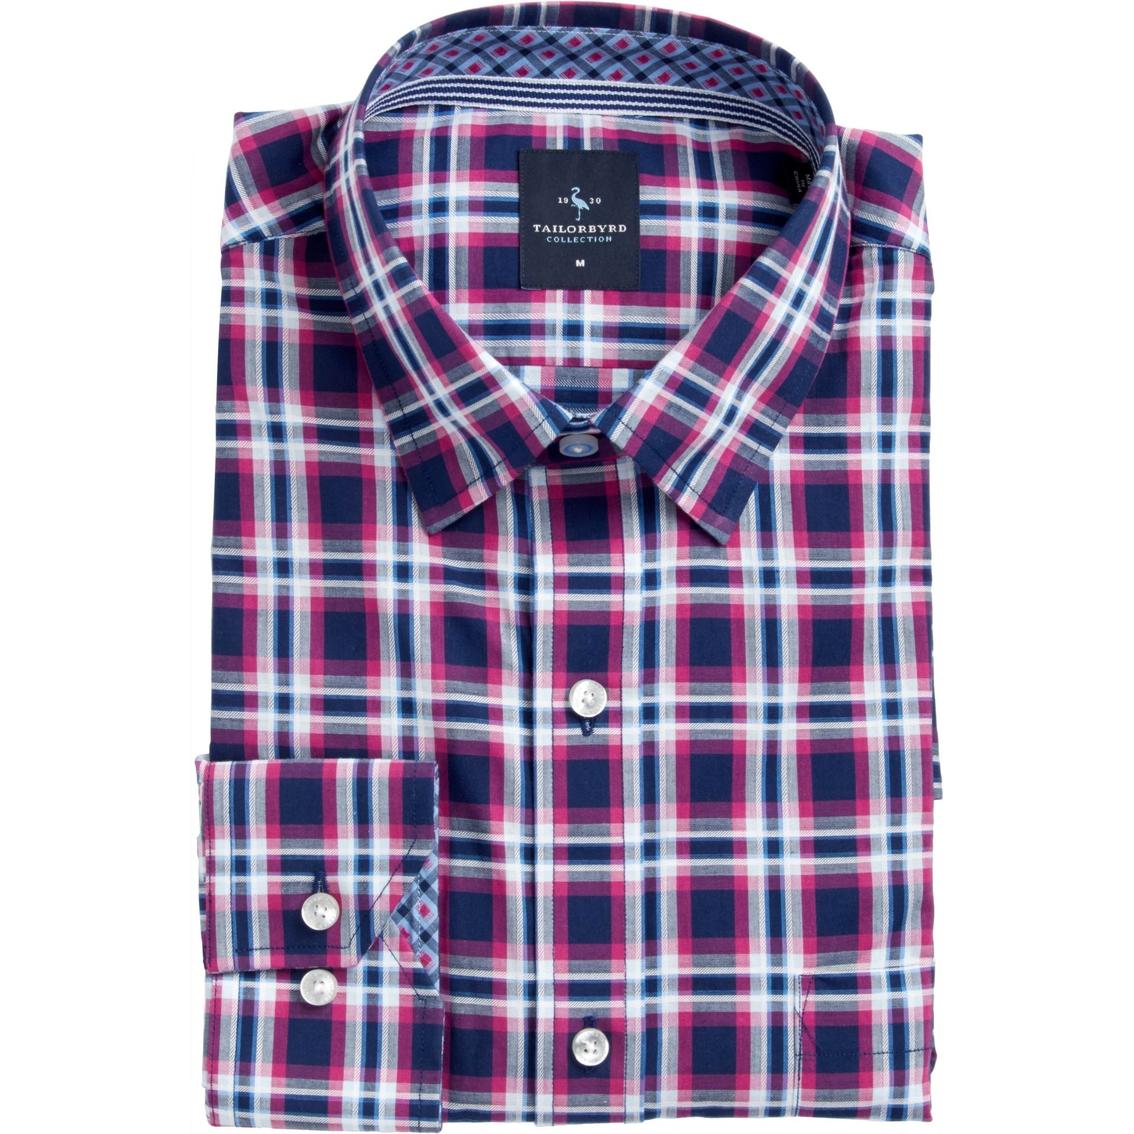 Tailorbyrd Fitz Roy Fuchsia Dress Shirt Dress Shirts Apparel